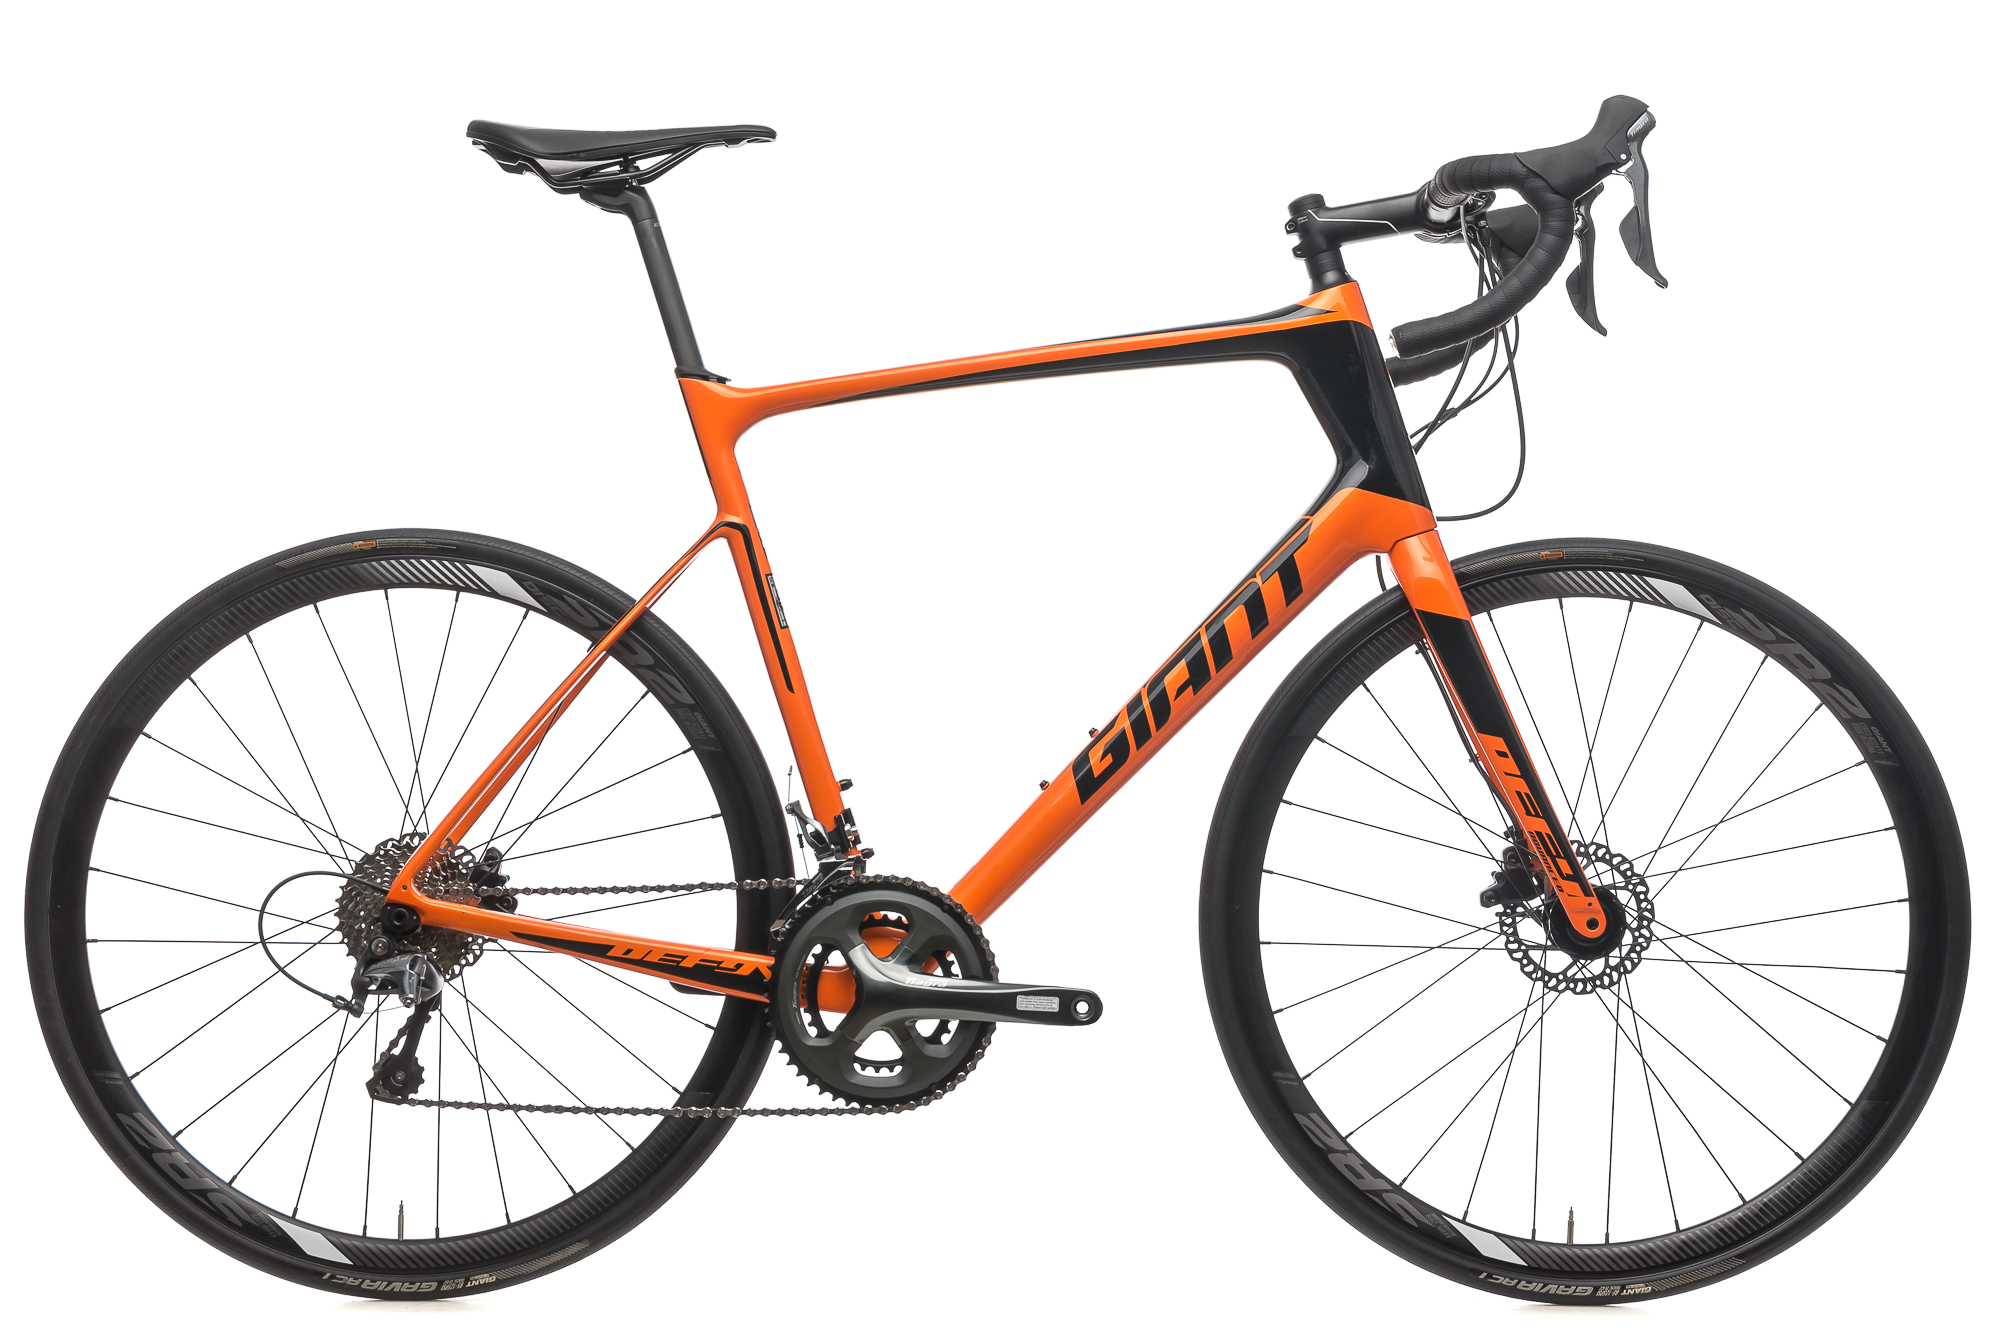 505198fb493 2018 Giant Defy Advanced 3 Road Bike X-Large Carbon Shimano Tiagra 10 Speed